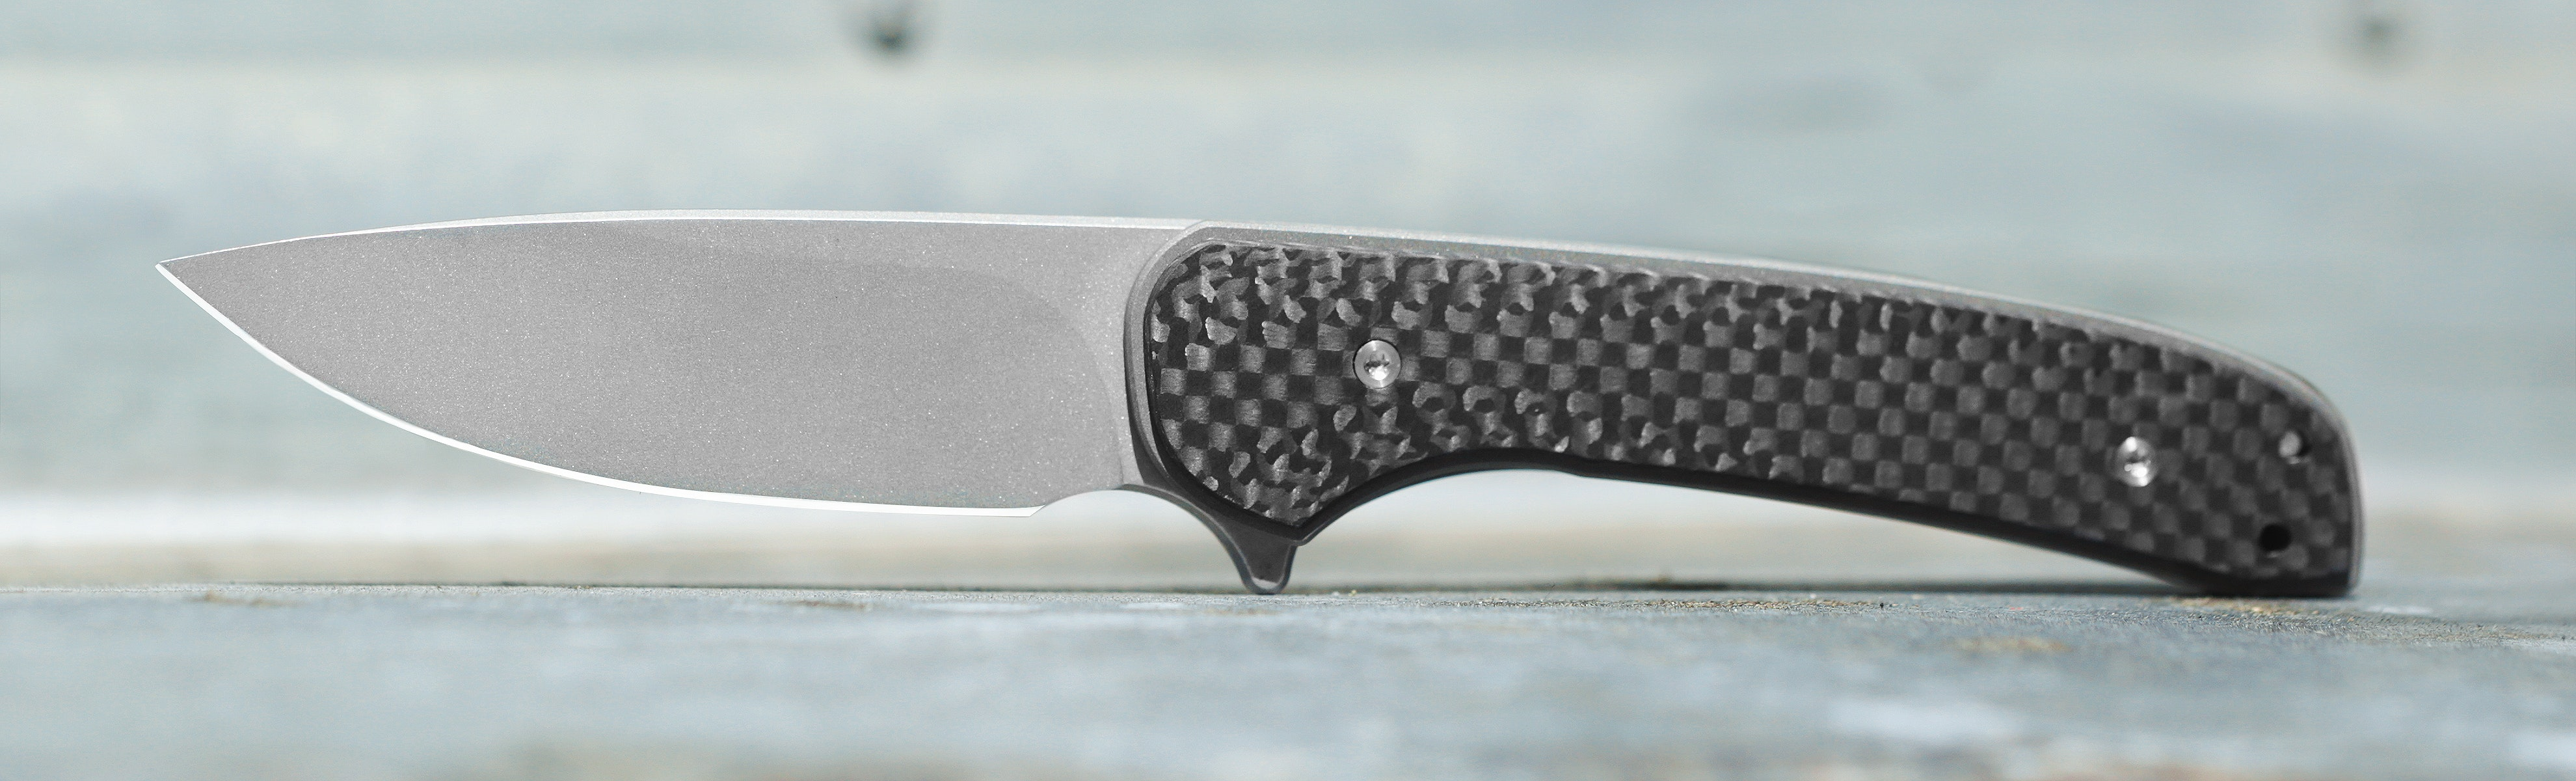 Massdrop x Ferrum Forge Gent Select Pocket Knife